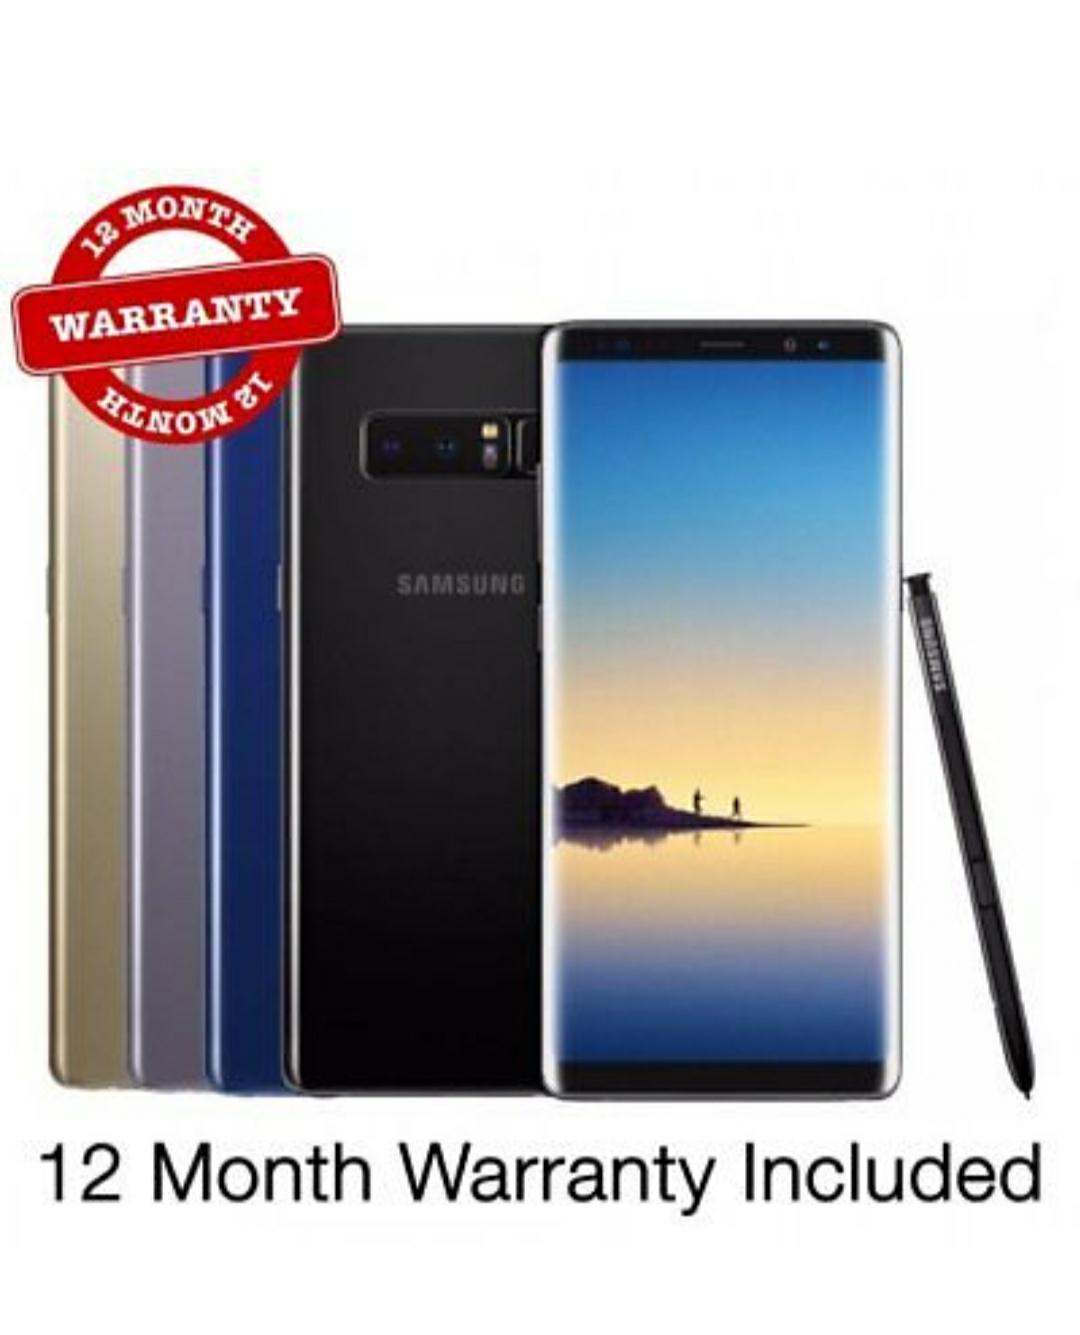 Samsung Galaxy Note 8 SM-N950F 64GB Black/Gold UNLOCKED In Very Good Condition £270 @ XS Items Ebay